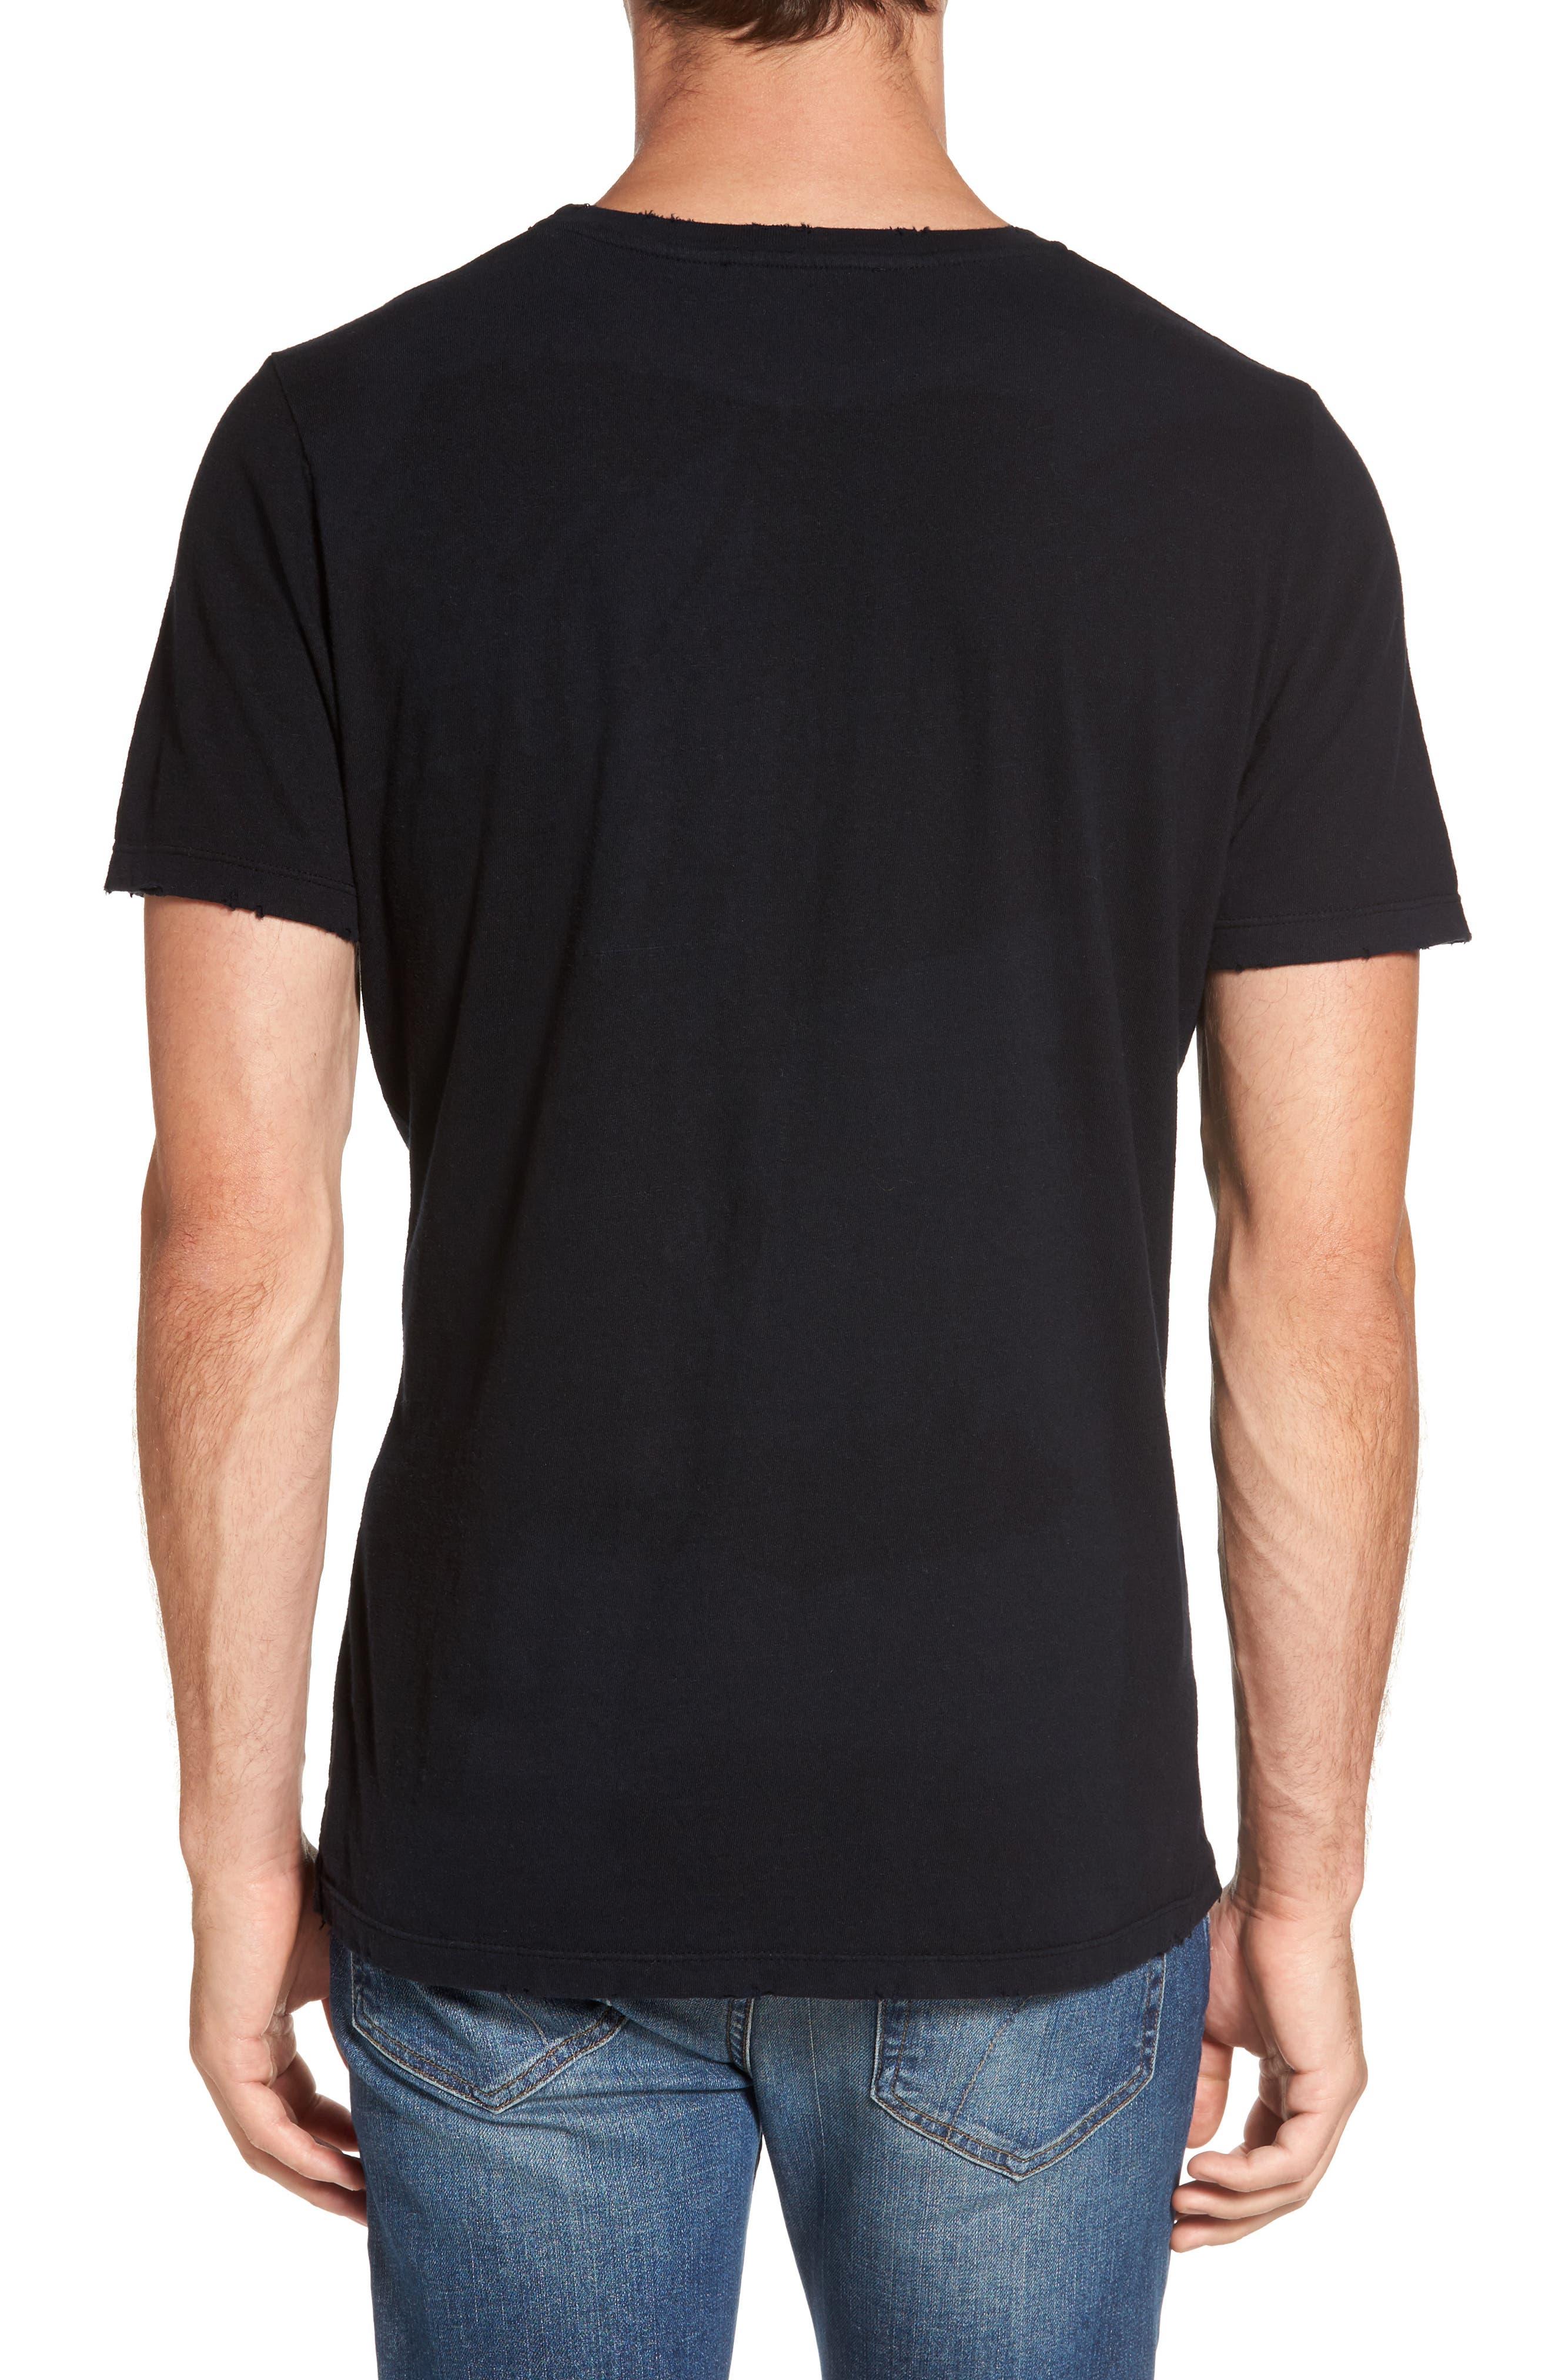 Bronco 3 T-Shirt,                             Alternate thumbnail 2, color,